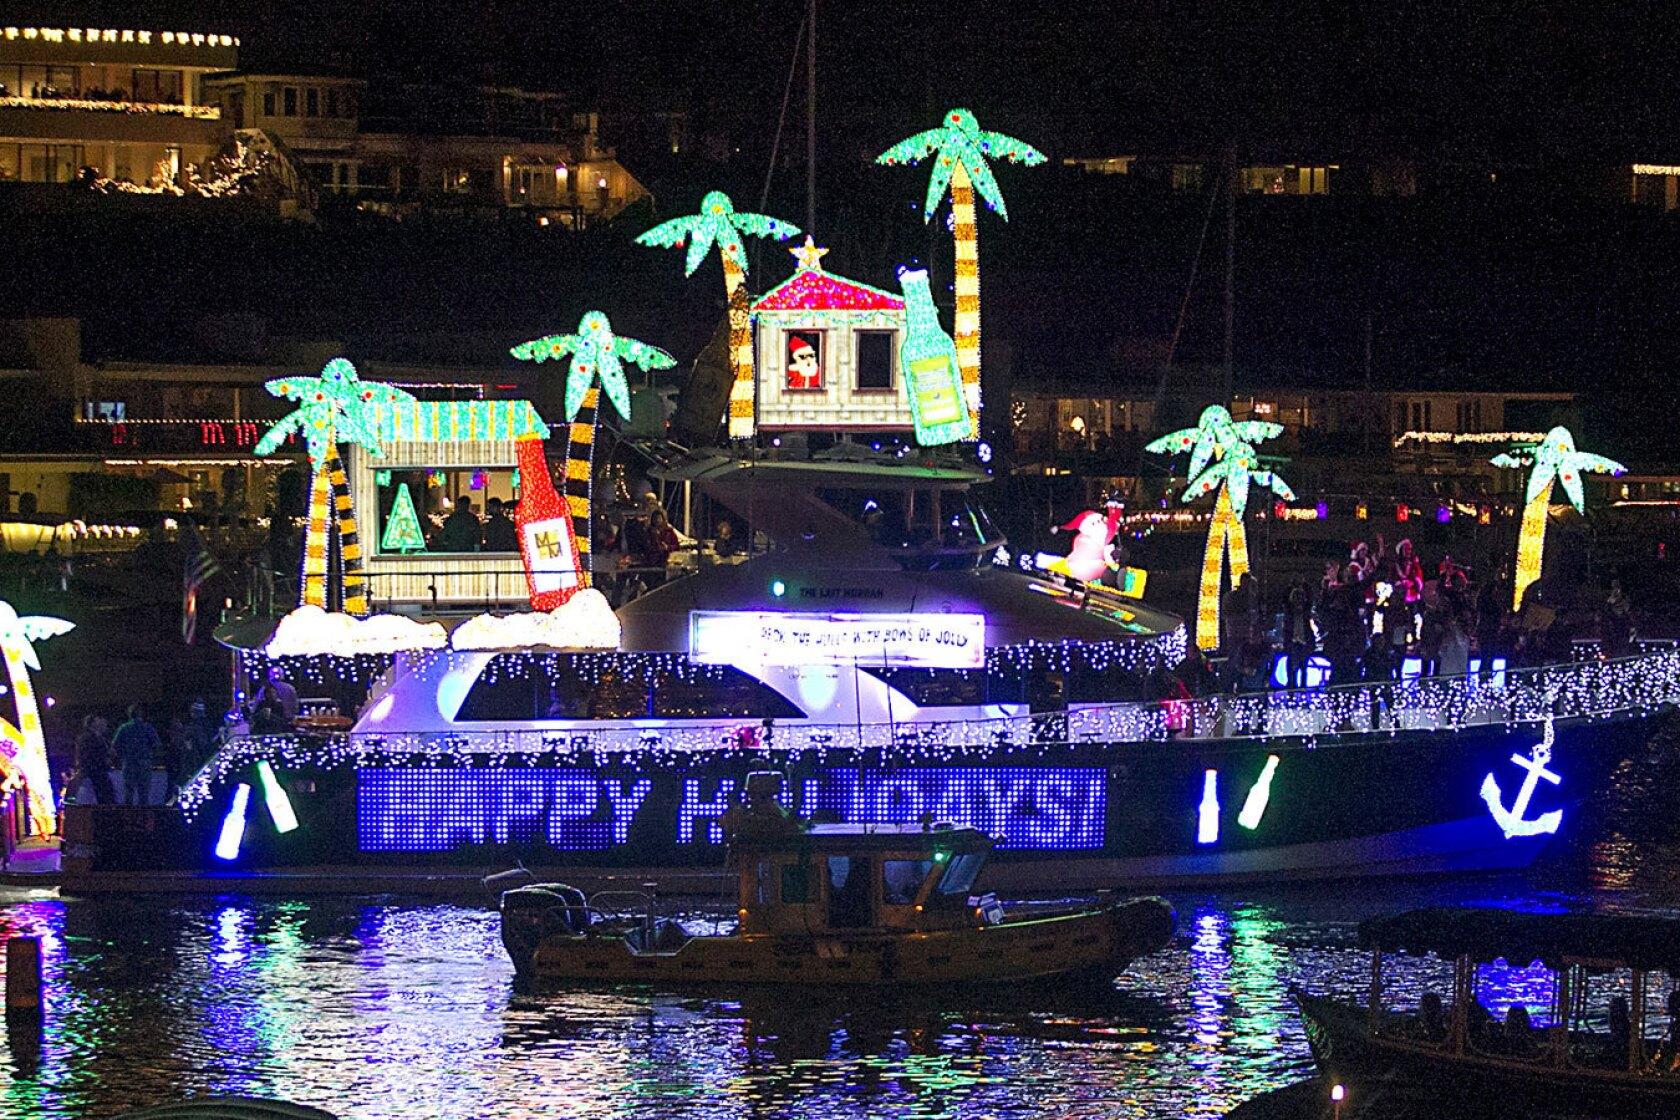 Newport Beach Christmas Lights Cruise.Newport Beach And Huntington Beach Host Annual Boat Parades